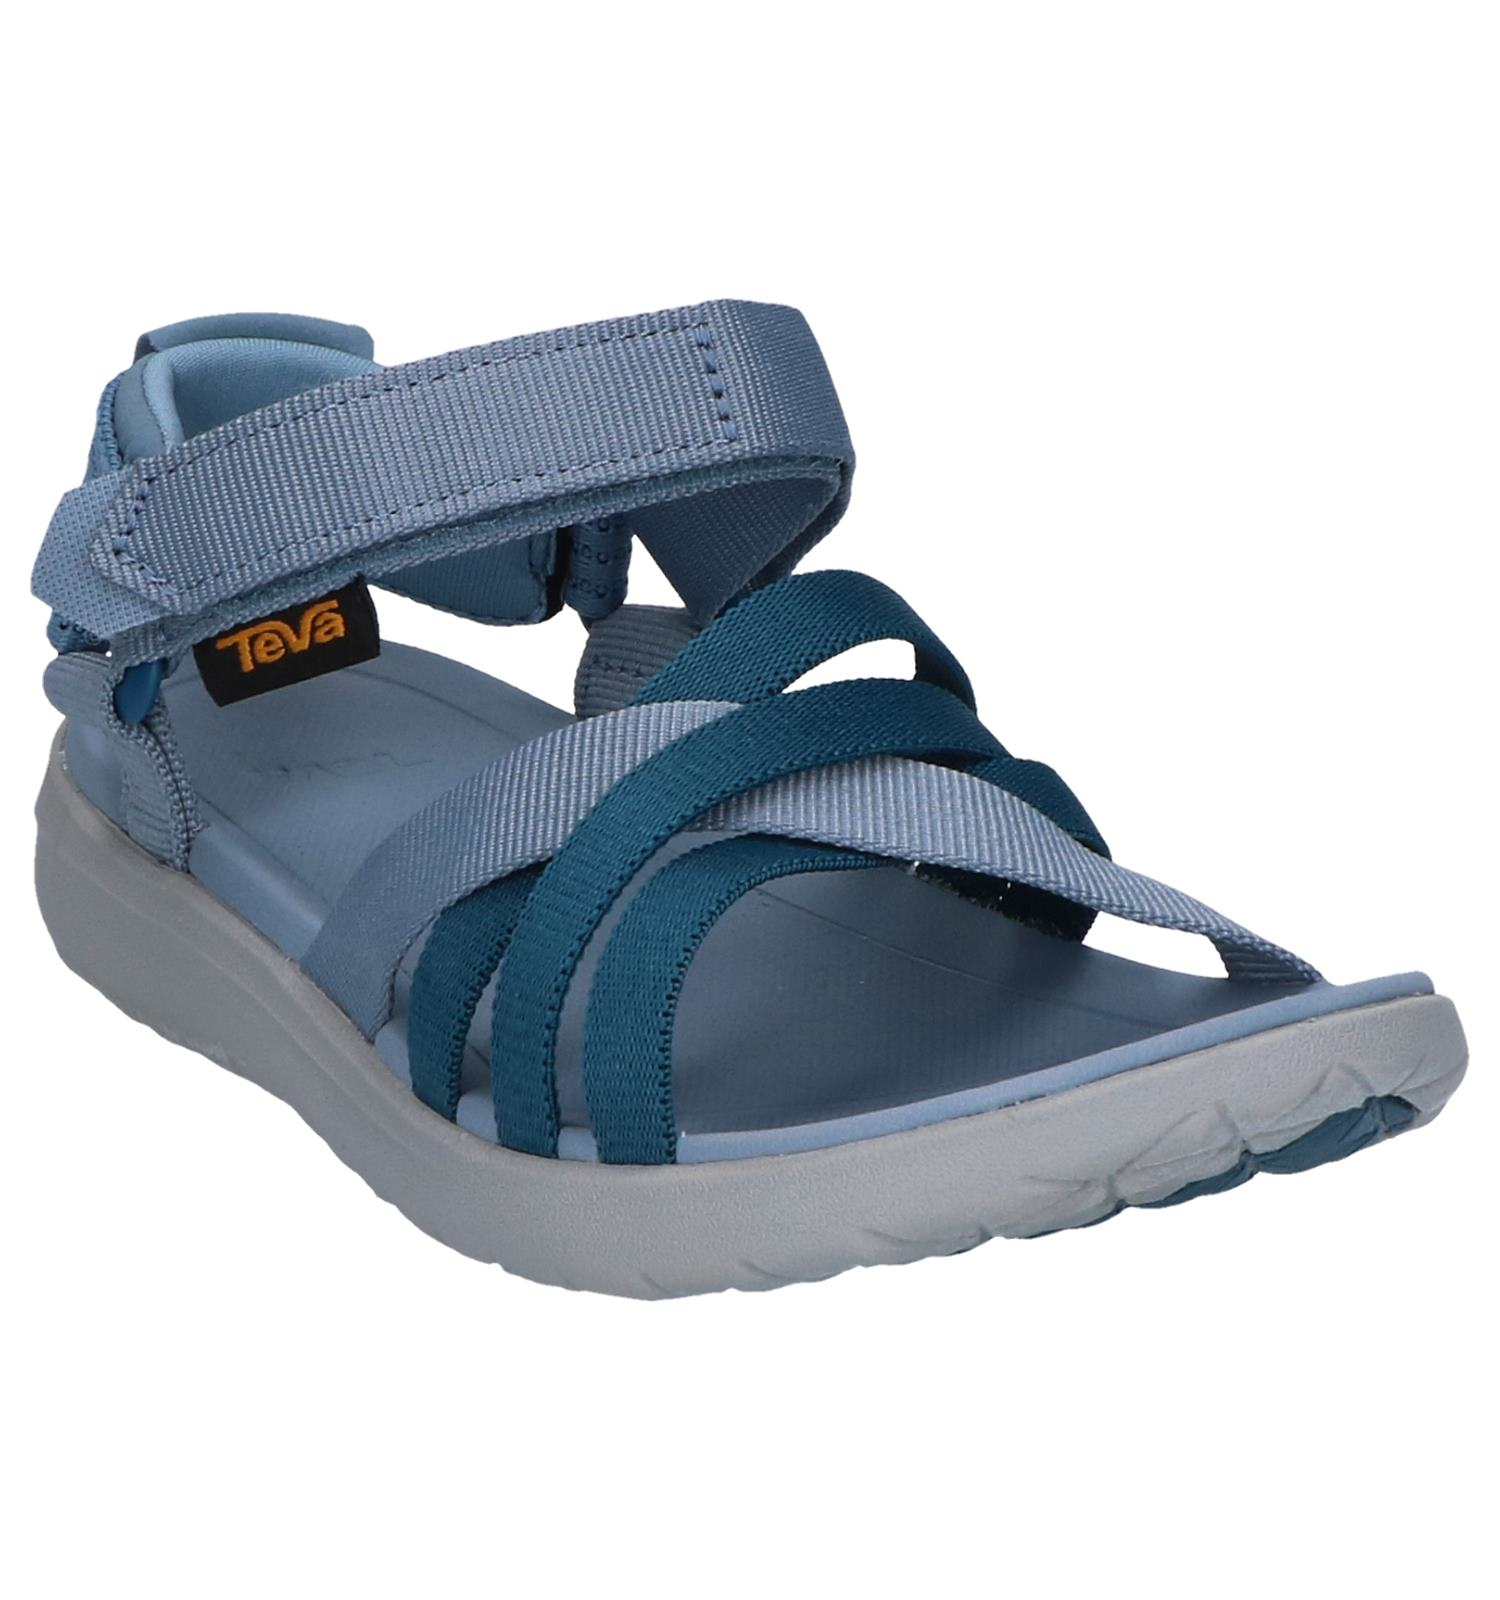 Sandalen Sandalen Teva Sanborn Blauwe Sandalen Teva Blauwe Sanborn Blauwe OPkuTiwXZ